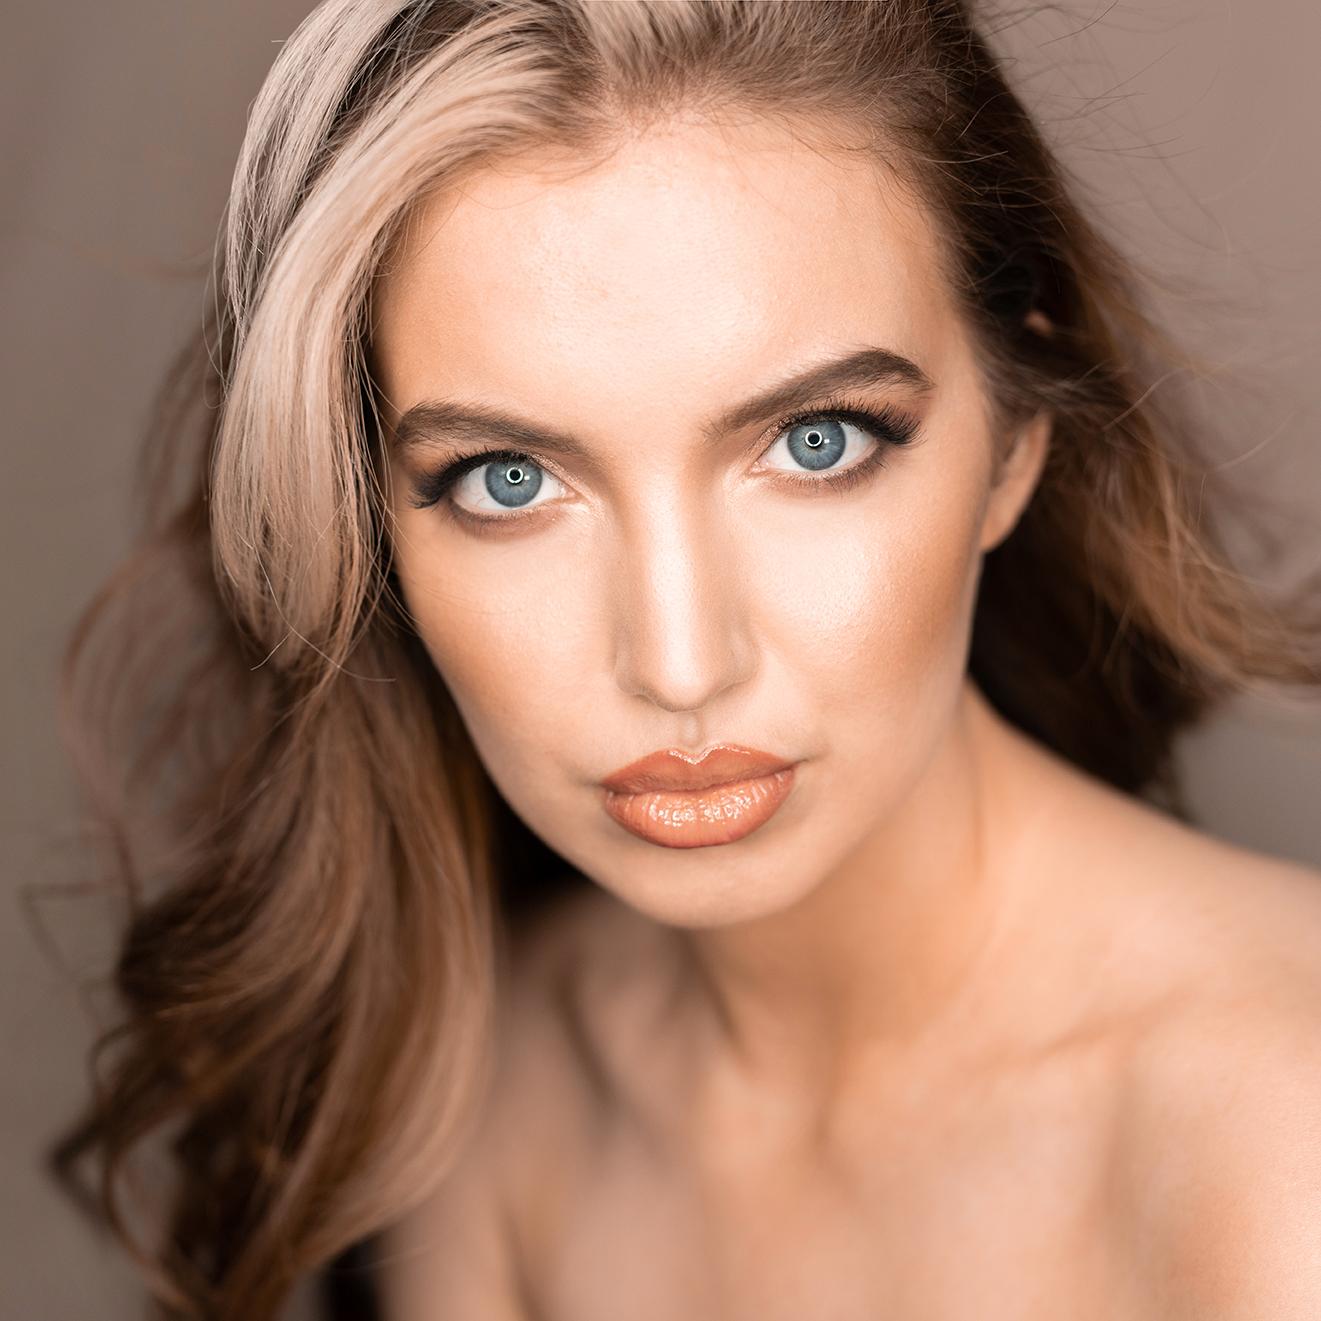 Courtney Baldwin